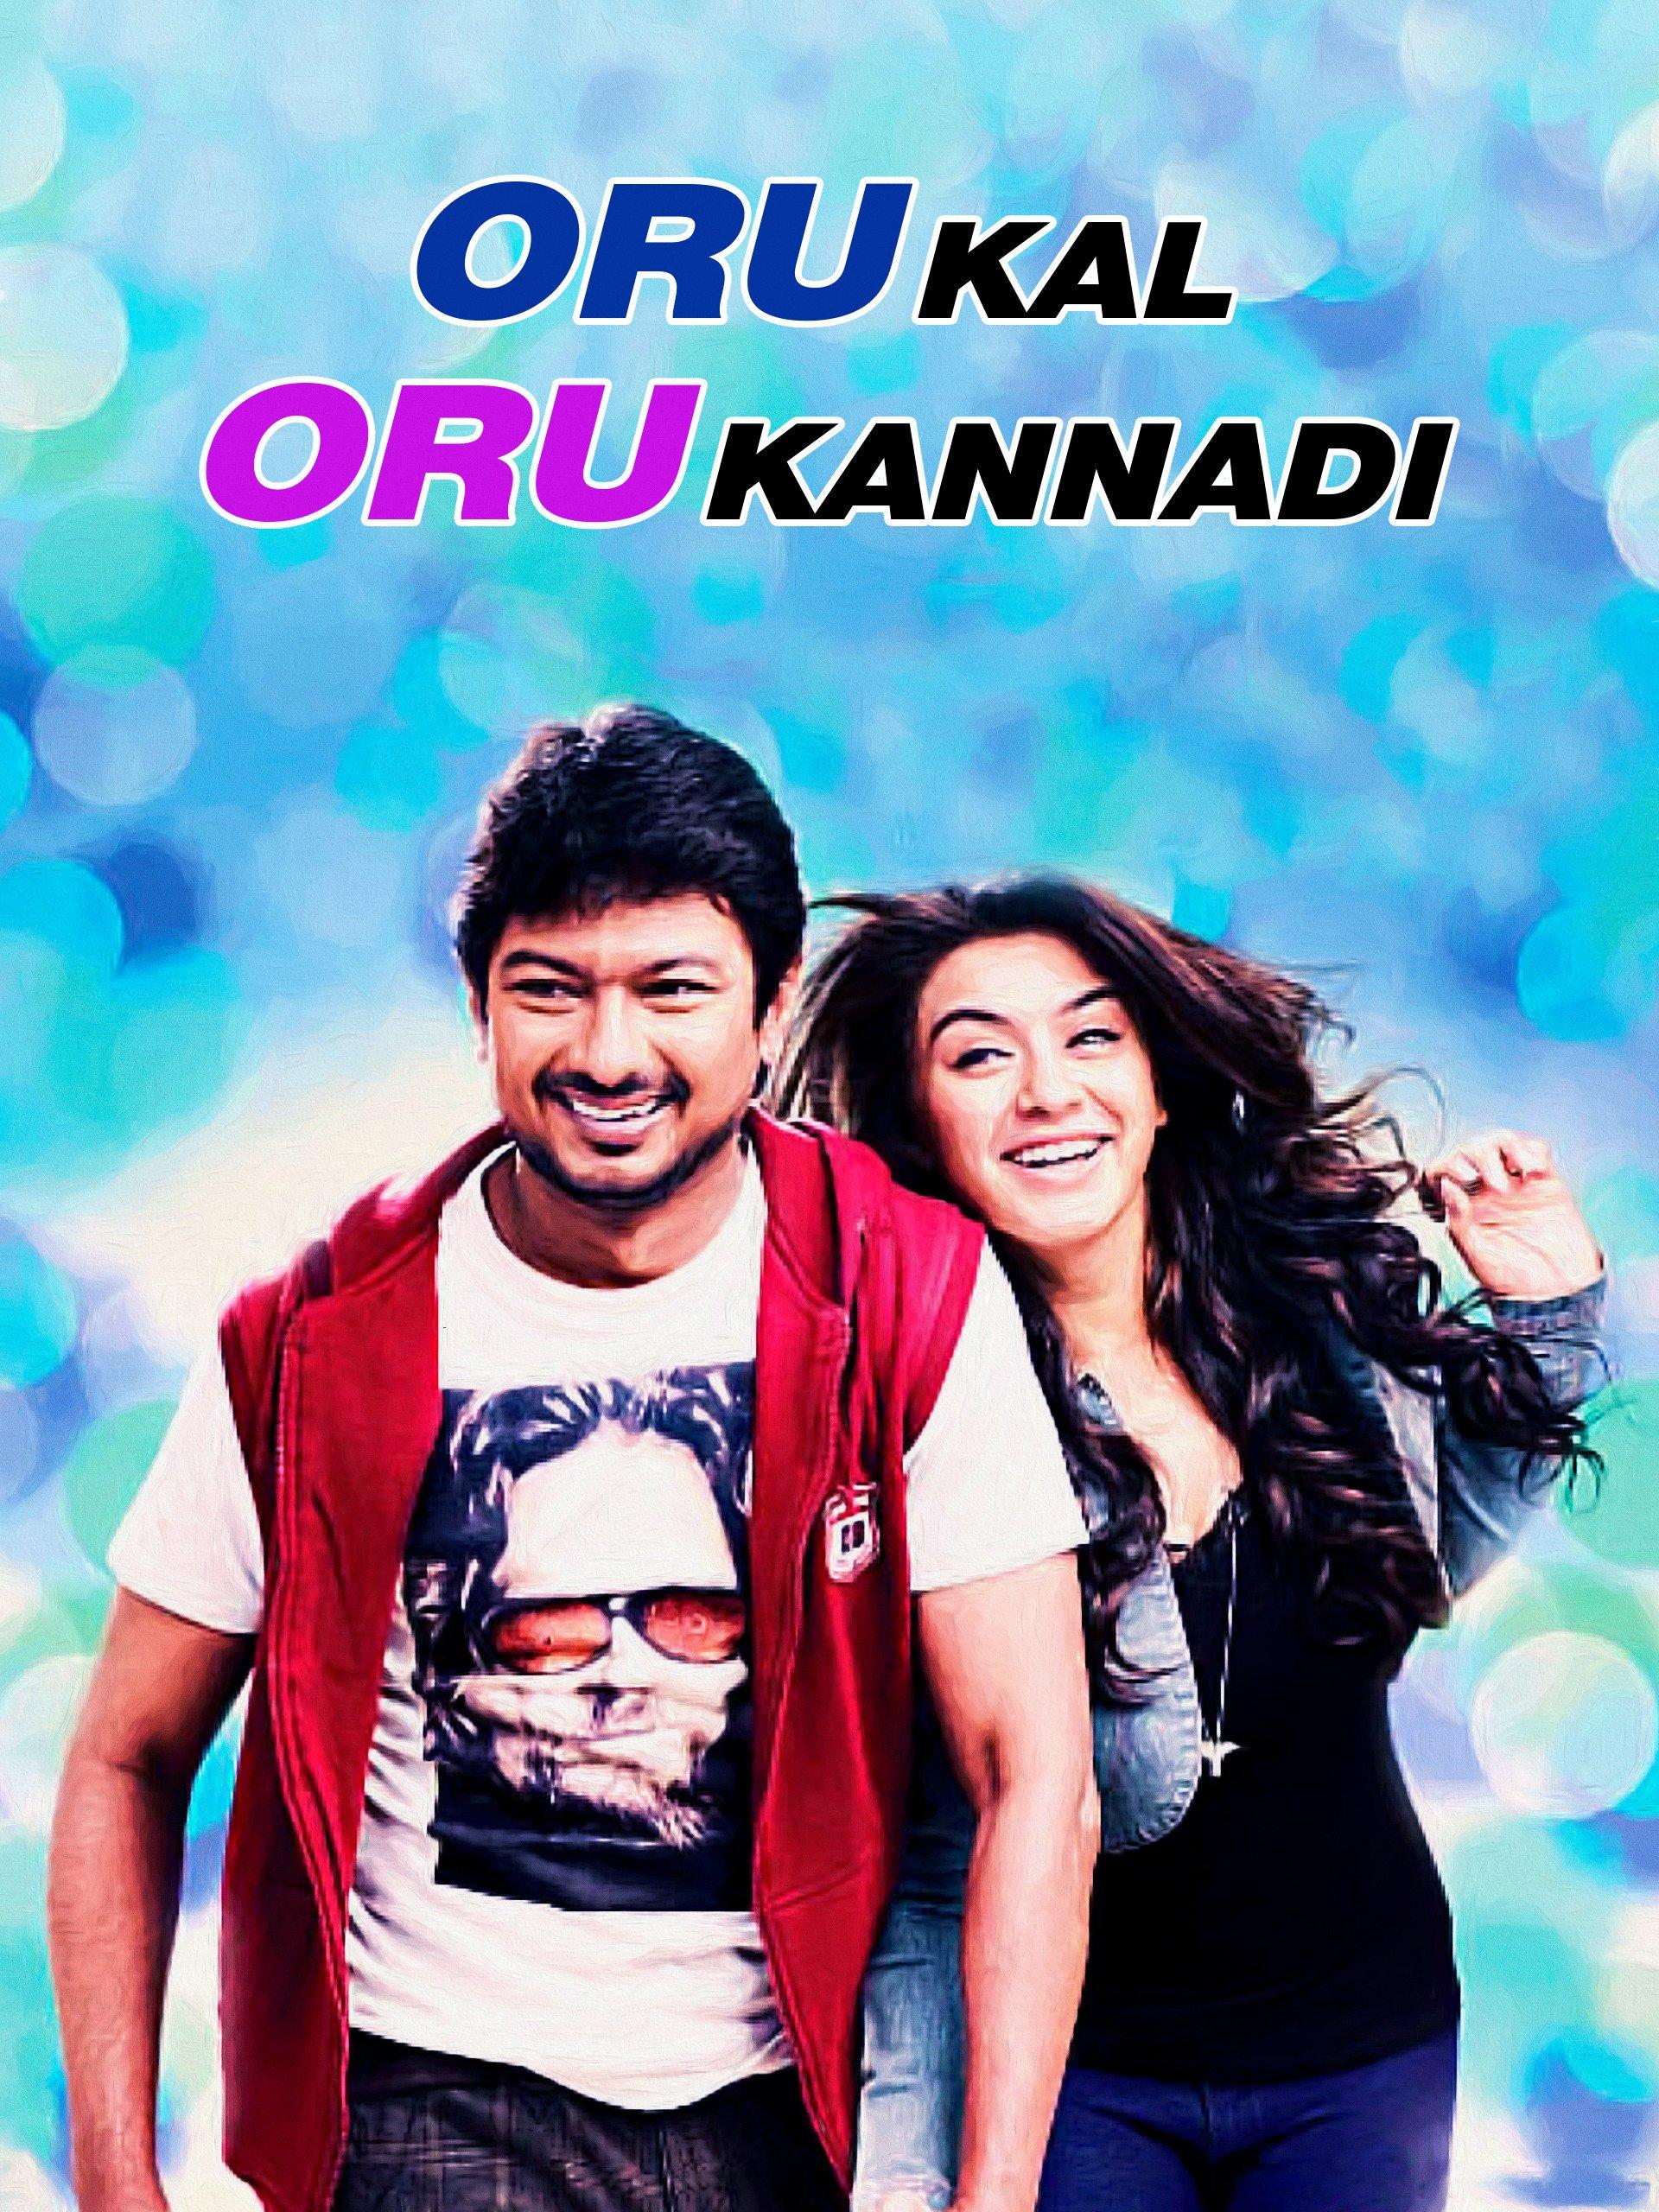 oru kal oru kannadi tamil full movie free download